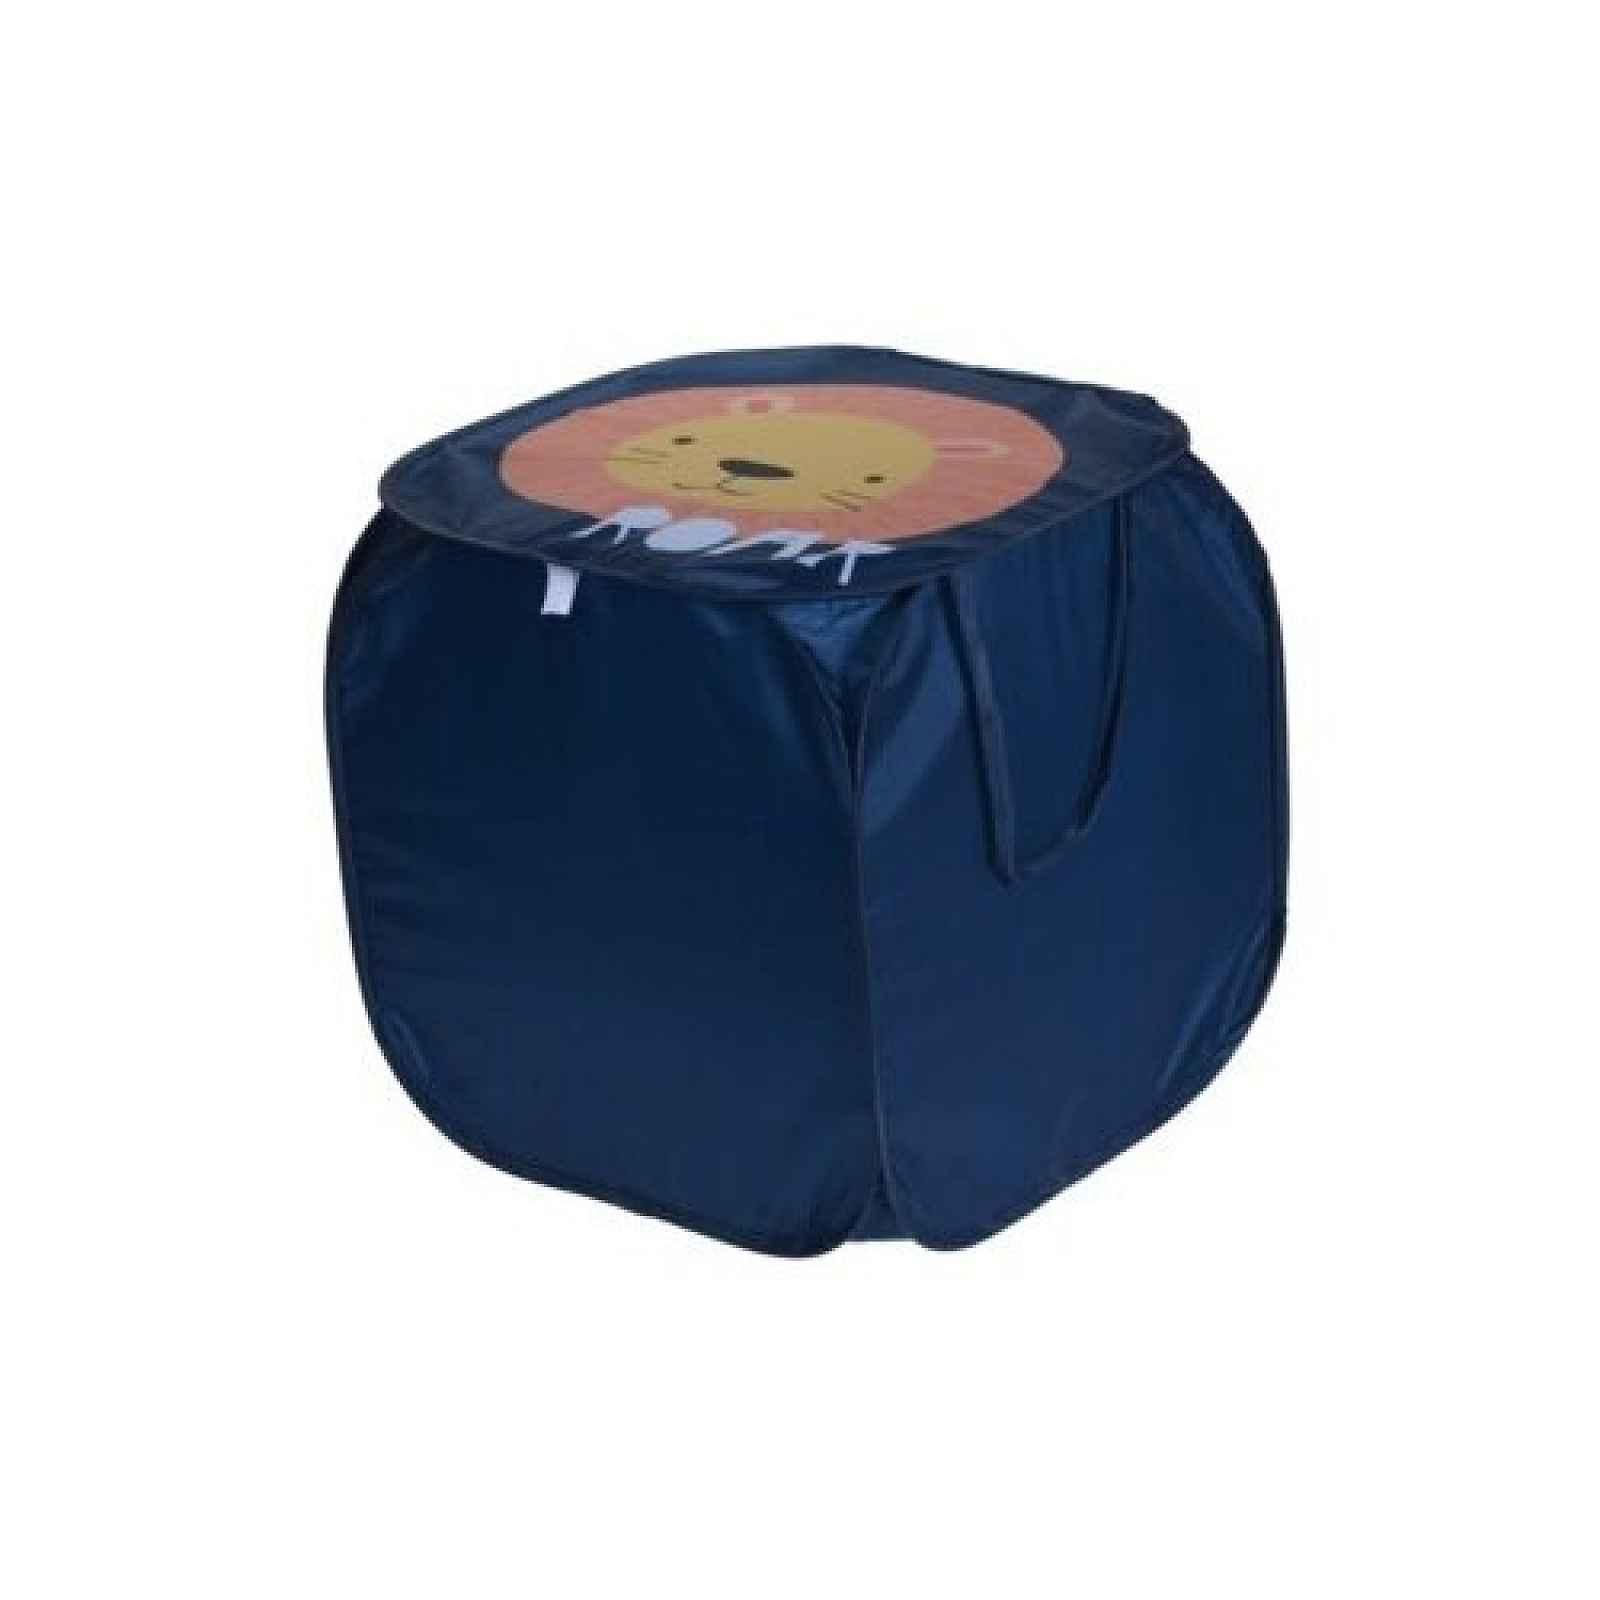 Textilní úložný box Hatu, lev, 45 x 45 x 45 cm